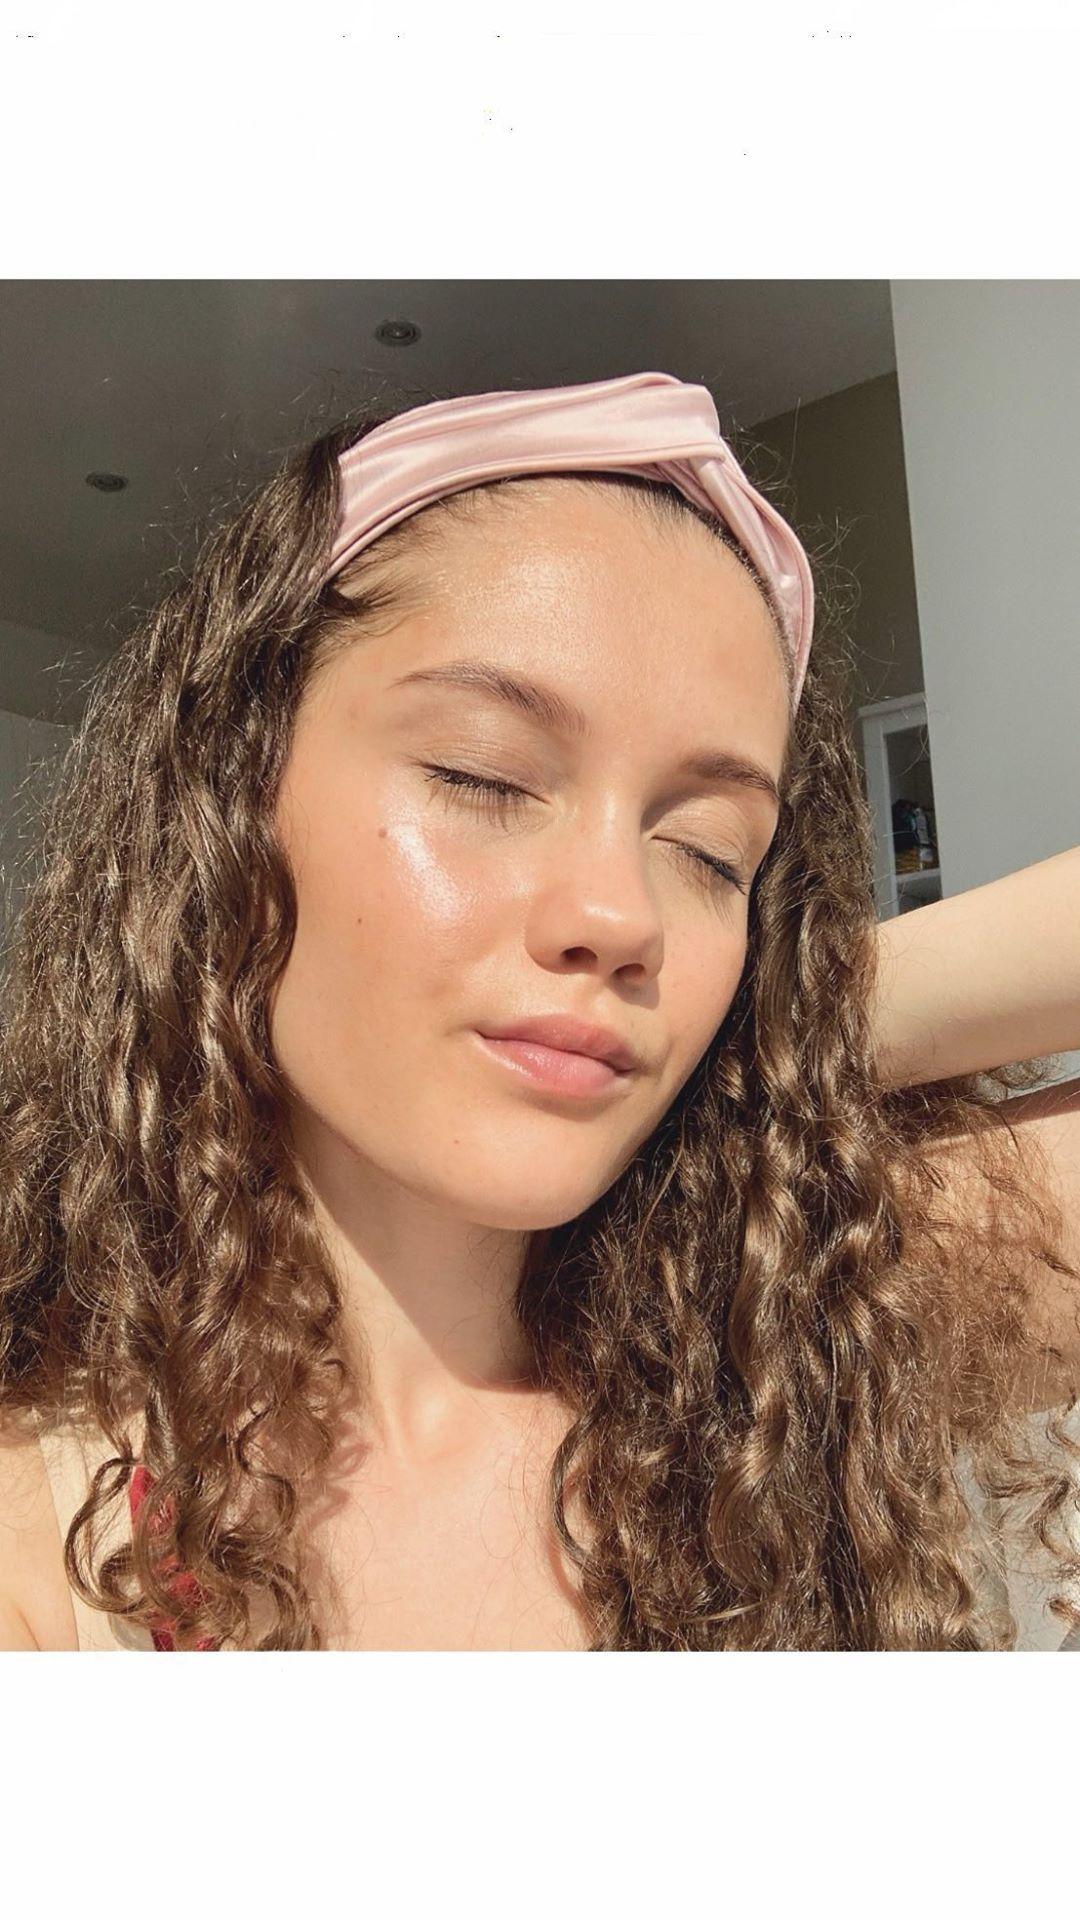 Easy Glowy Glass Skin Makeup Look. Details on Instagram